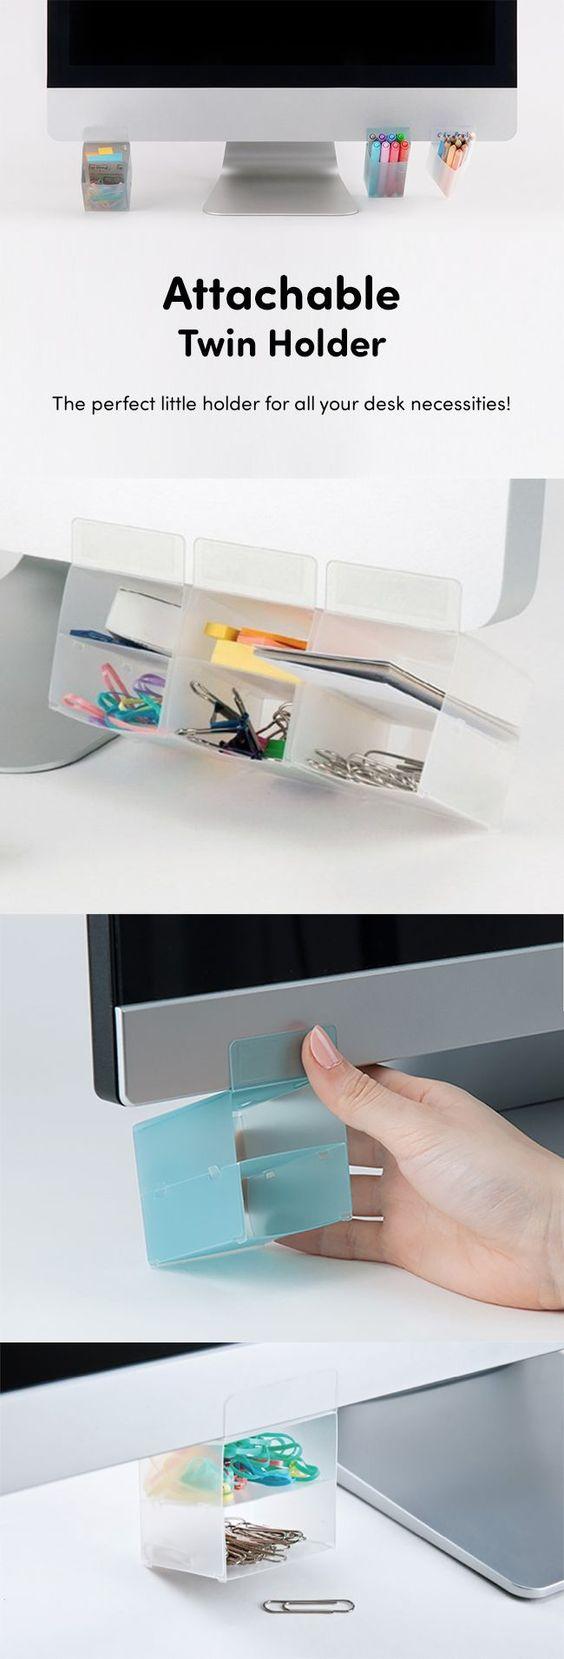 mac, computer, office